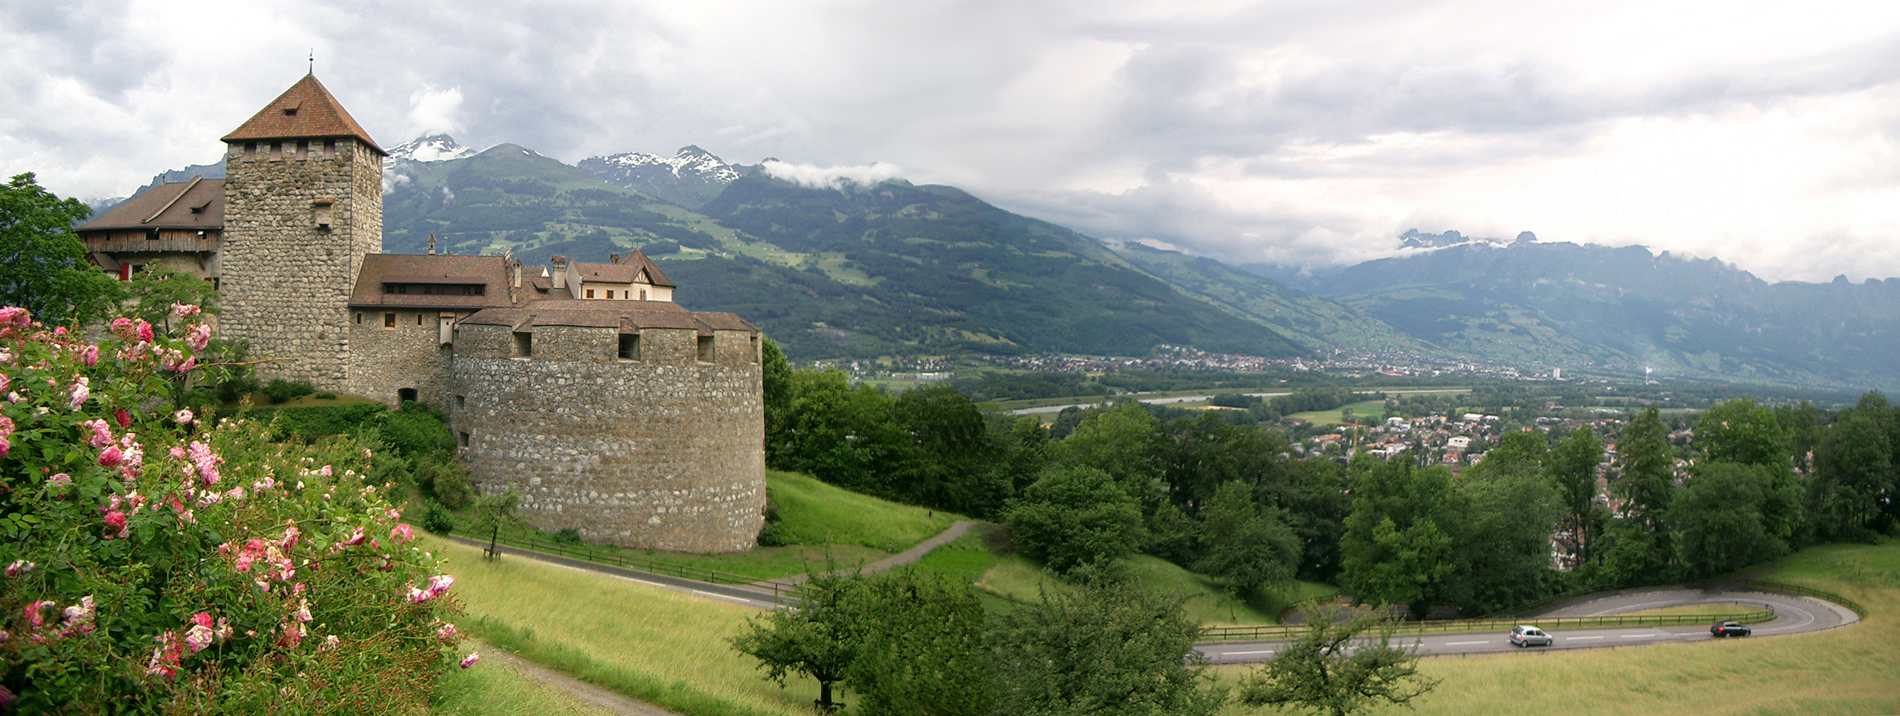 Лихтенштейн. Вадуц. Крепость